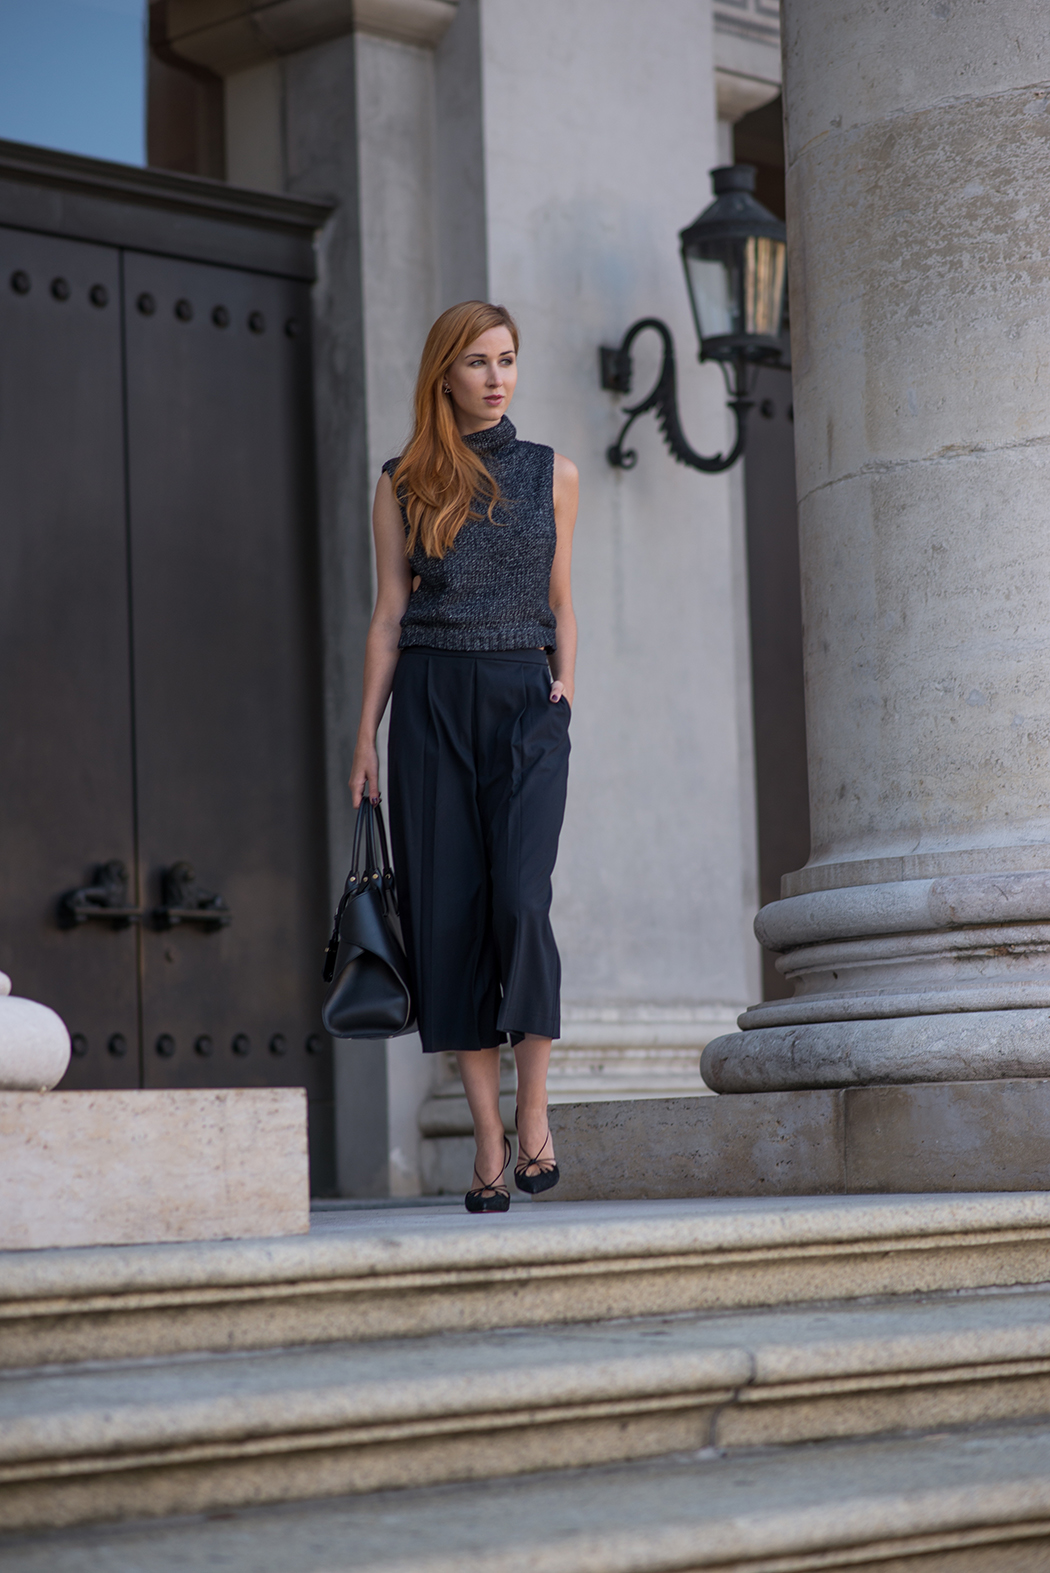 Fashionblog-Fashionblogger-München-Deutschland-Fashion-Blog-Lifestyle-Lindarella-Linda-Rella-Rollkragen-Pollunder-Strick-Palazzo-Hose-Louboutin-Heels-2-web